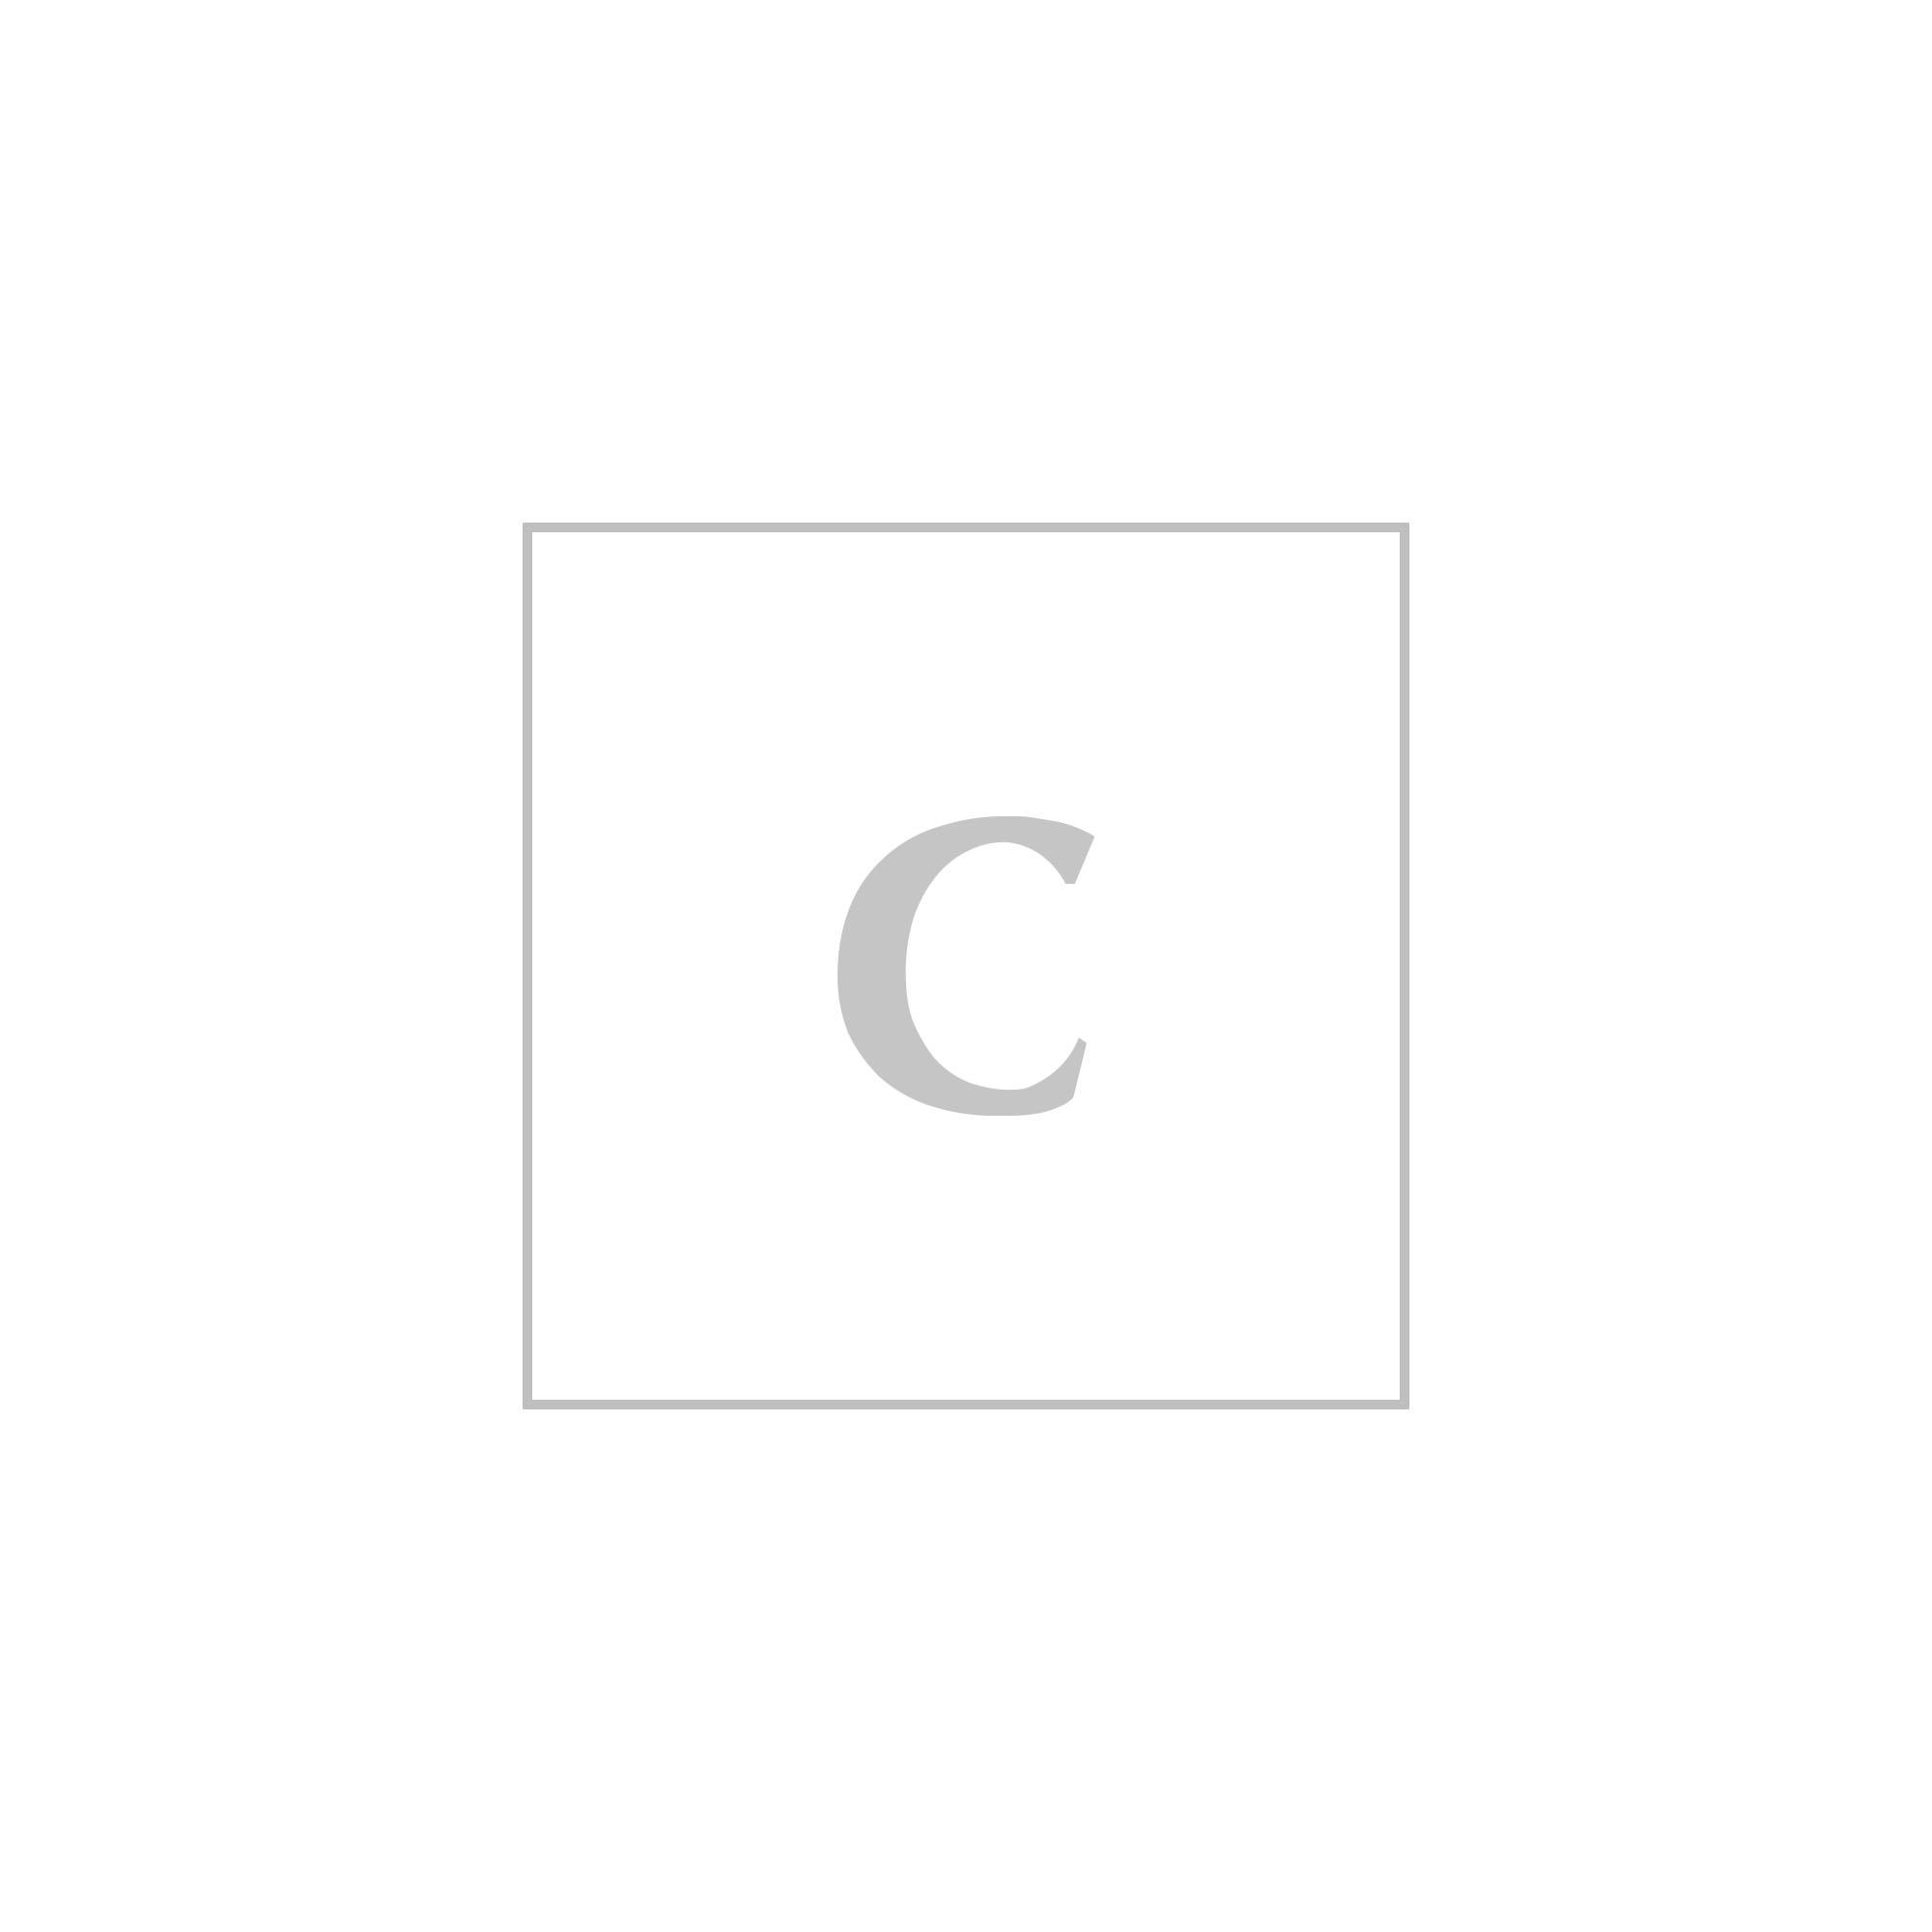 Moncler giubbotto lemaire